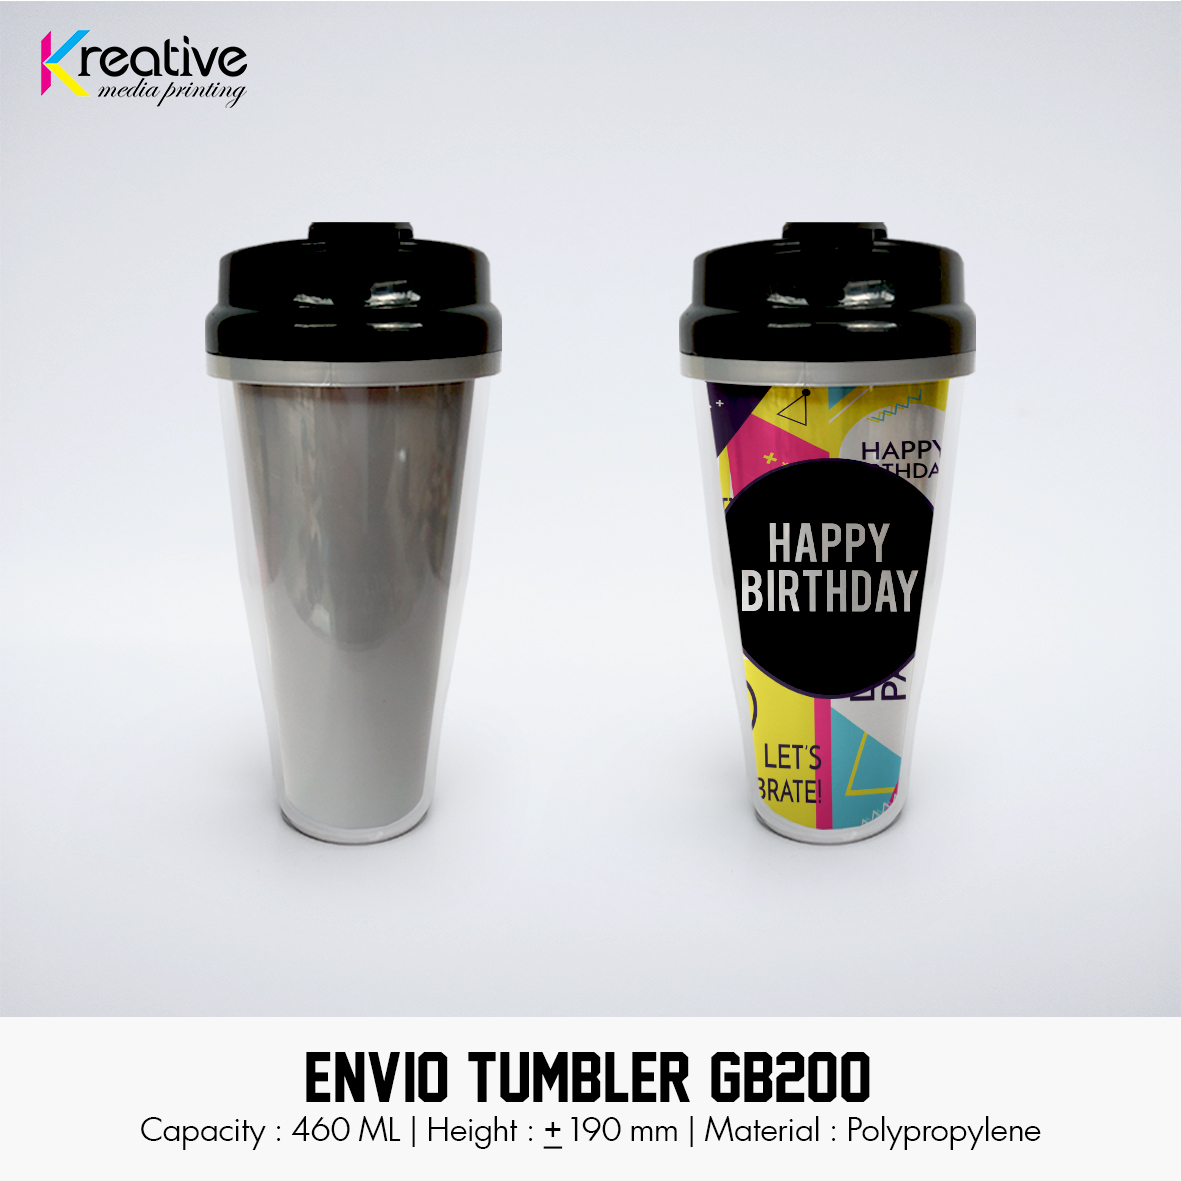 Envio Tumbler  GB200 Technoplast (1)